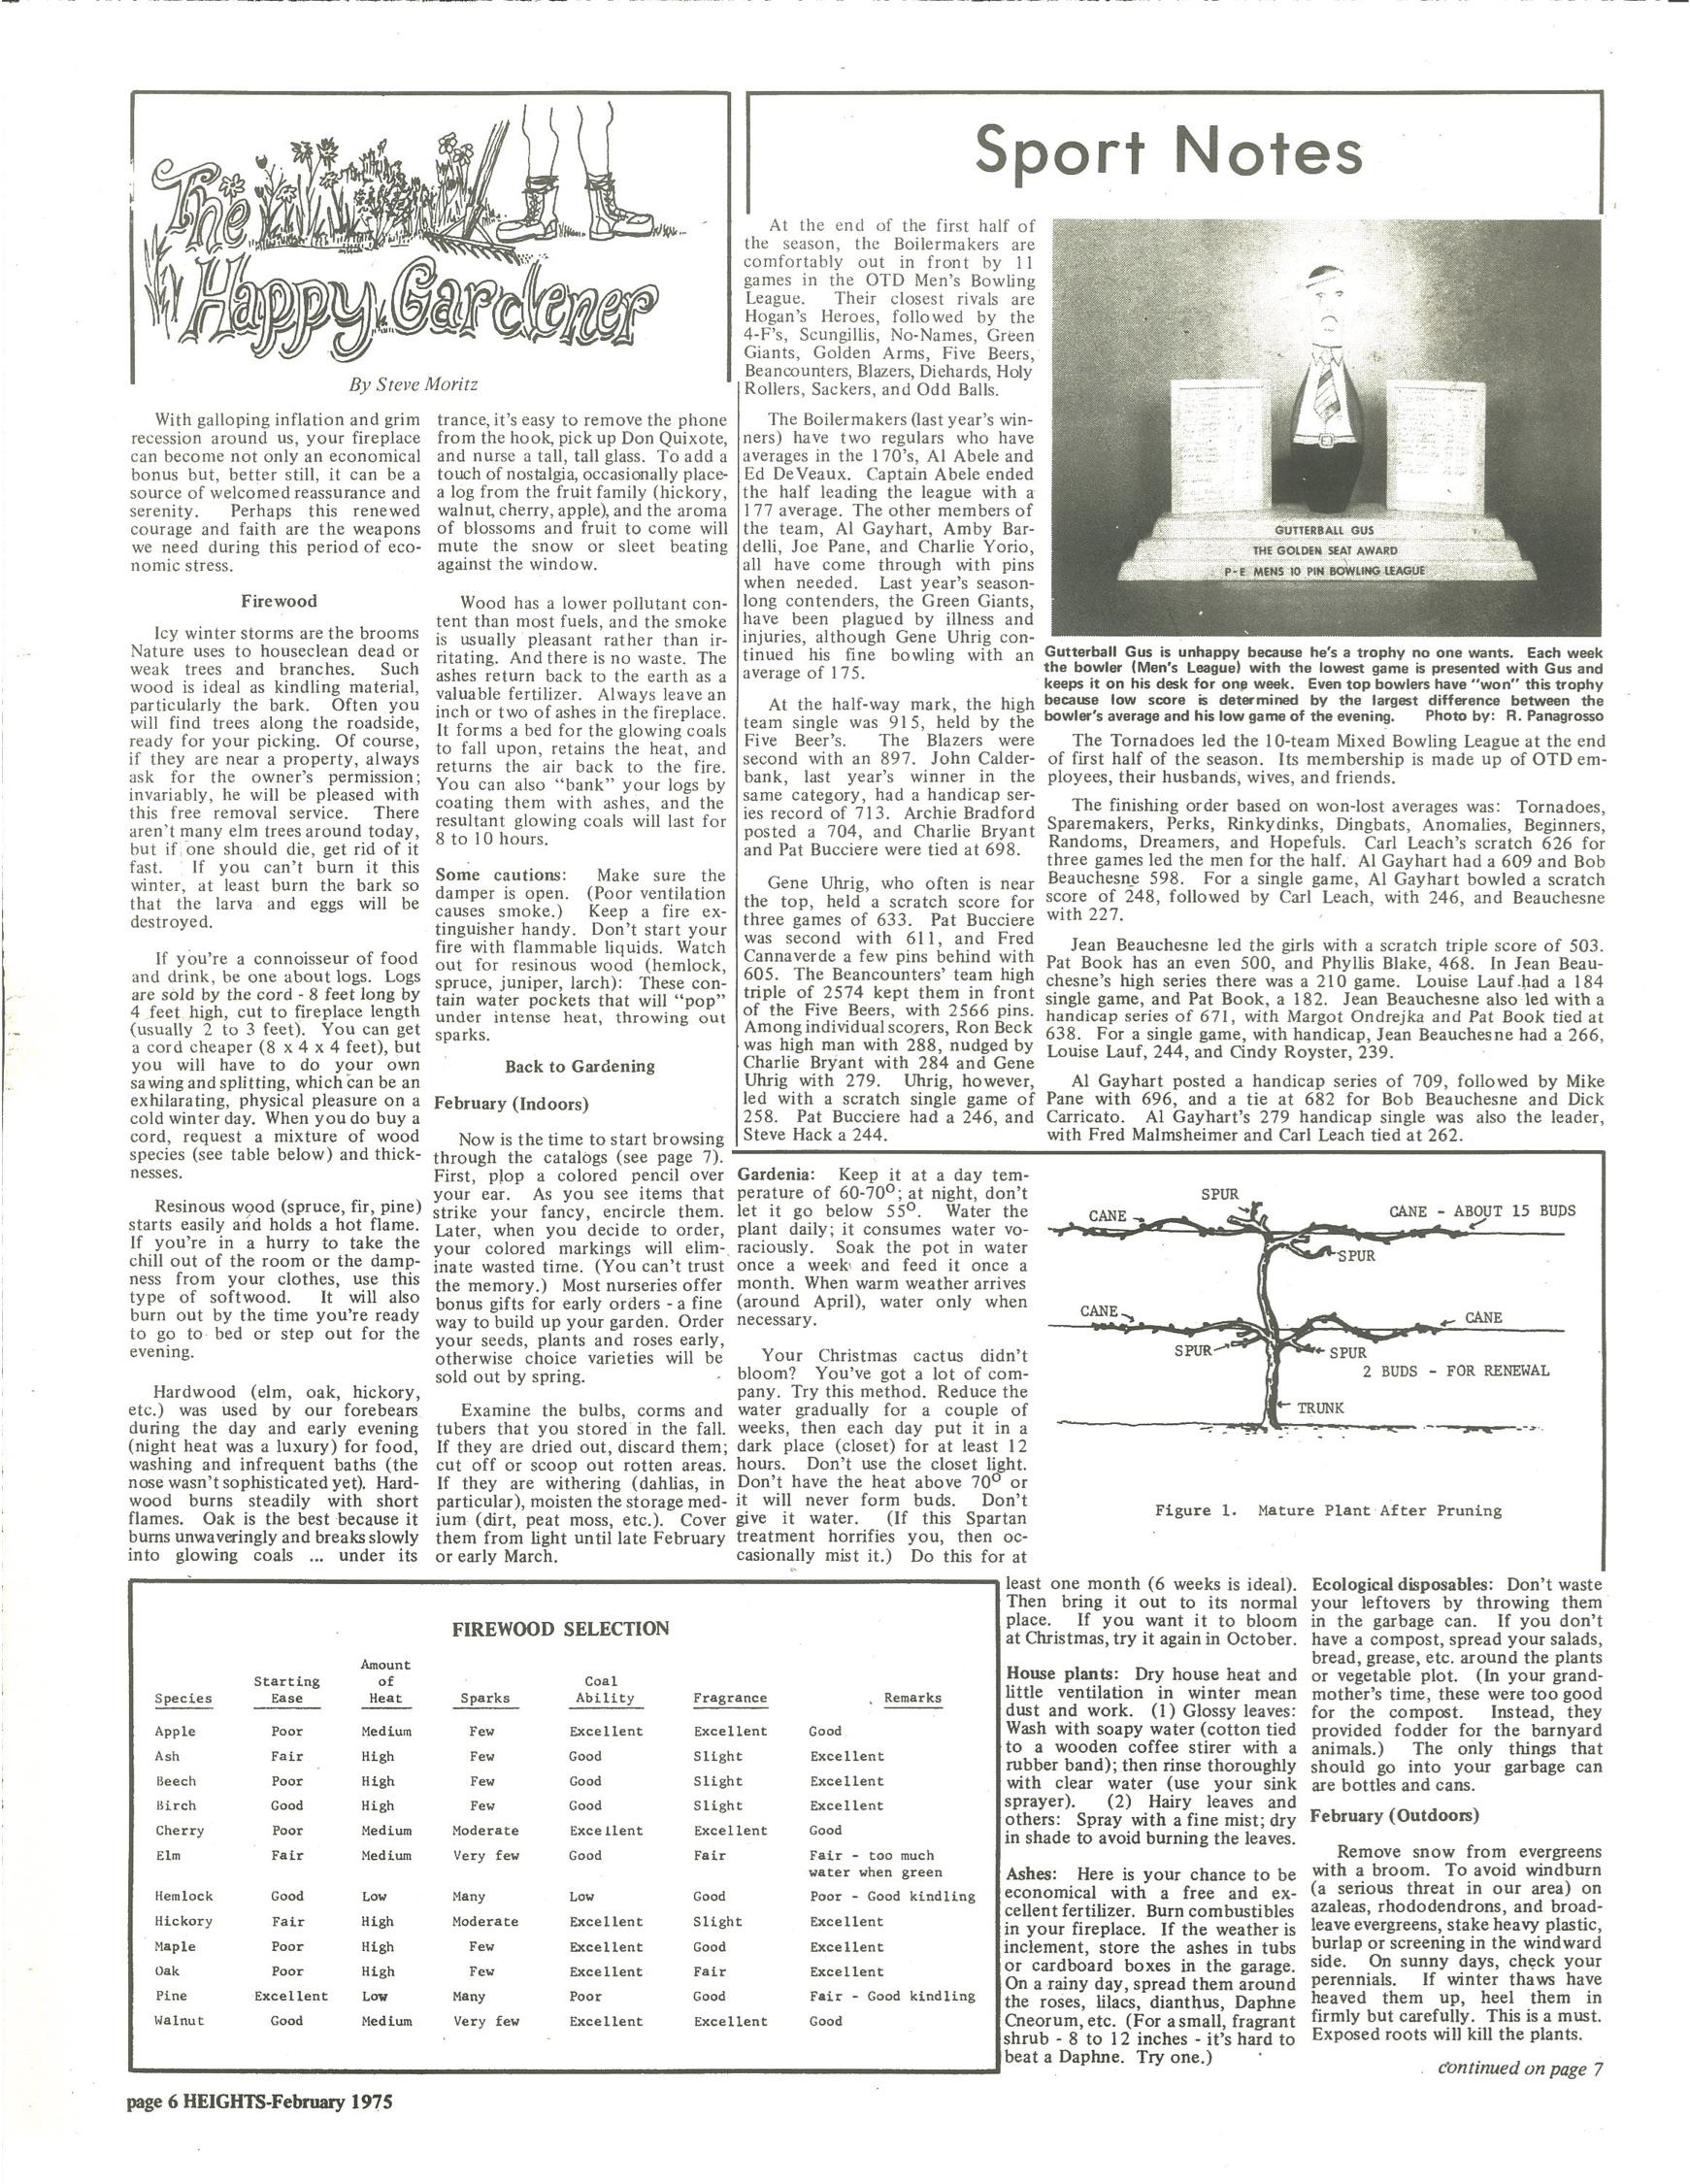 vol 8 num 1 page 6.jpg